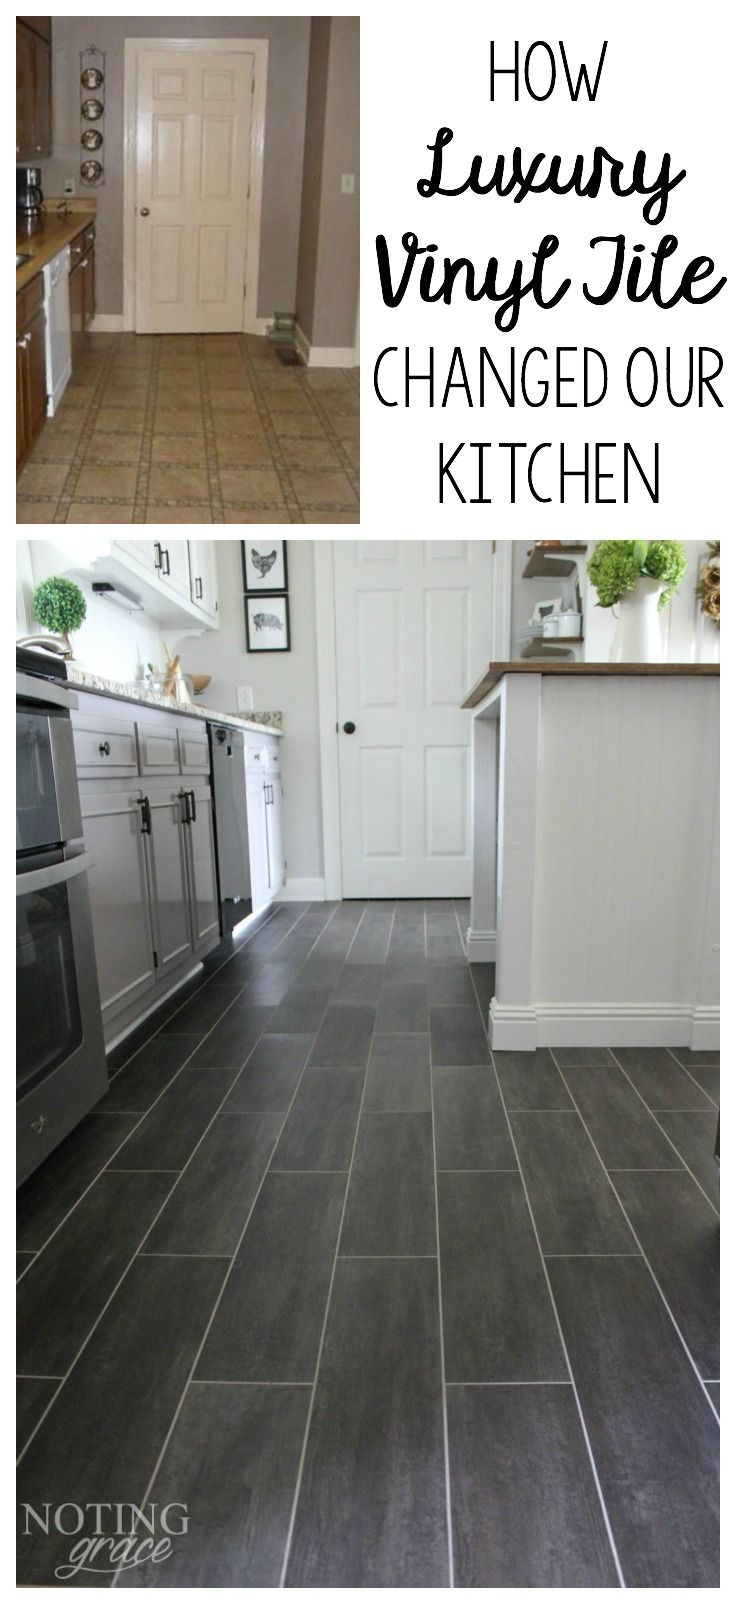 diy kitchen flooring kitchen ideas diy kitchen flooring diy flooring kitchen flooring on kitchen flooring ideas id=49997